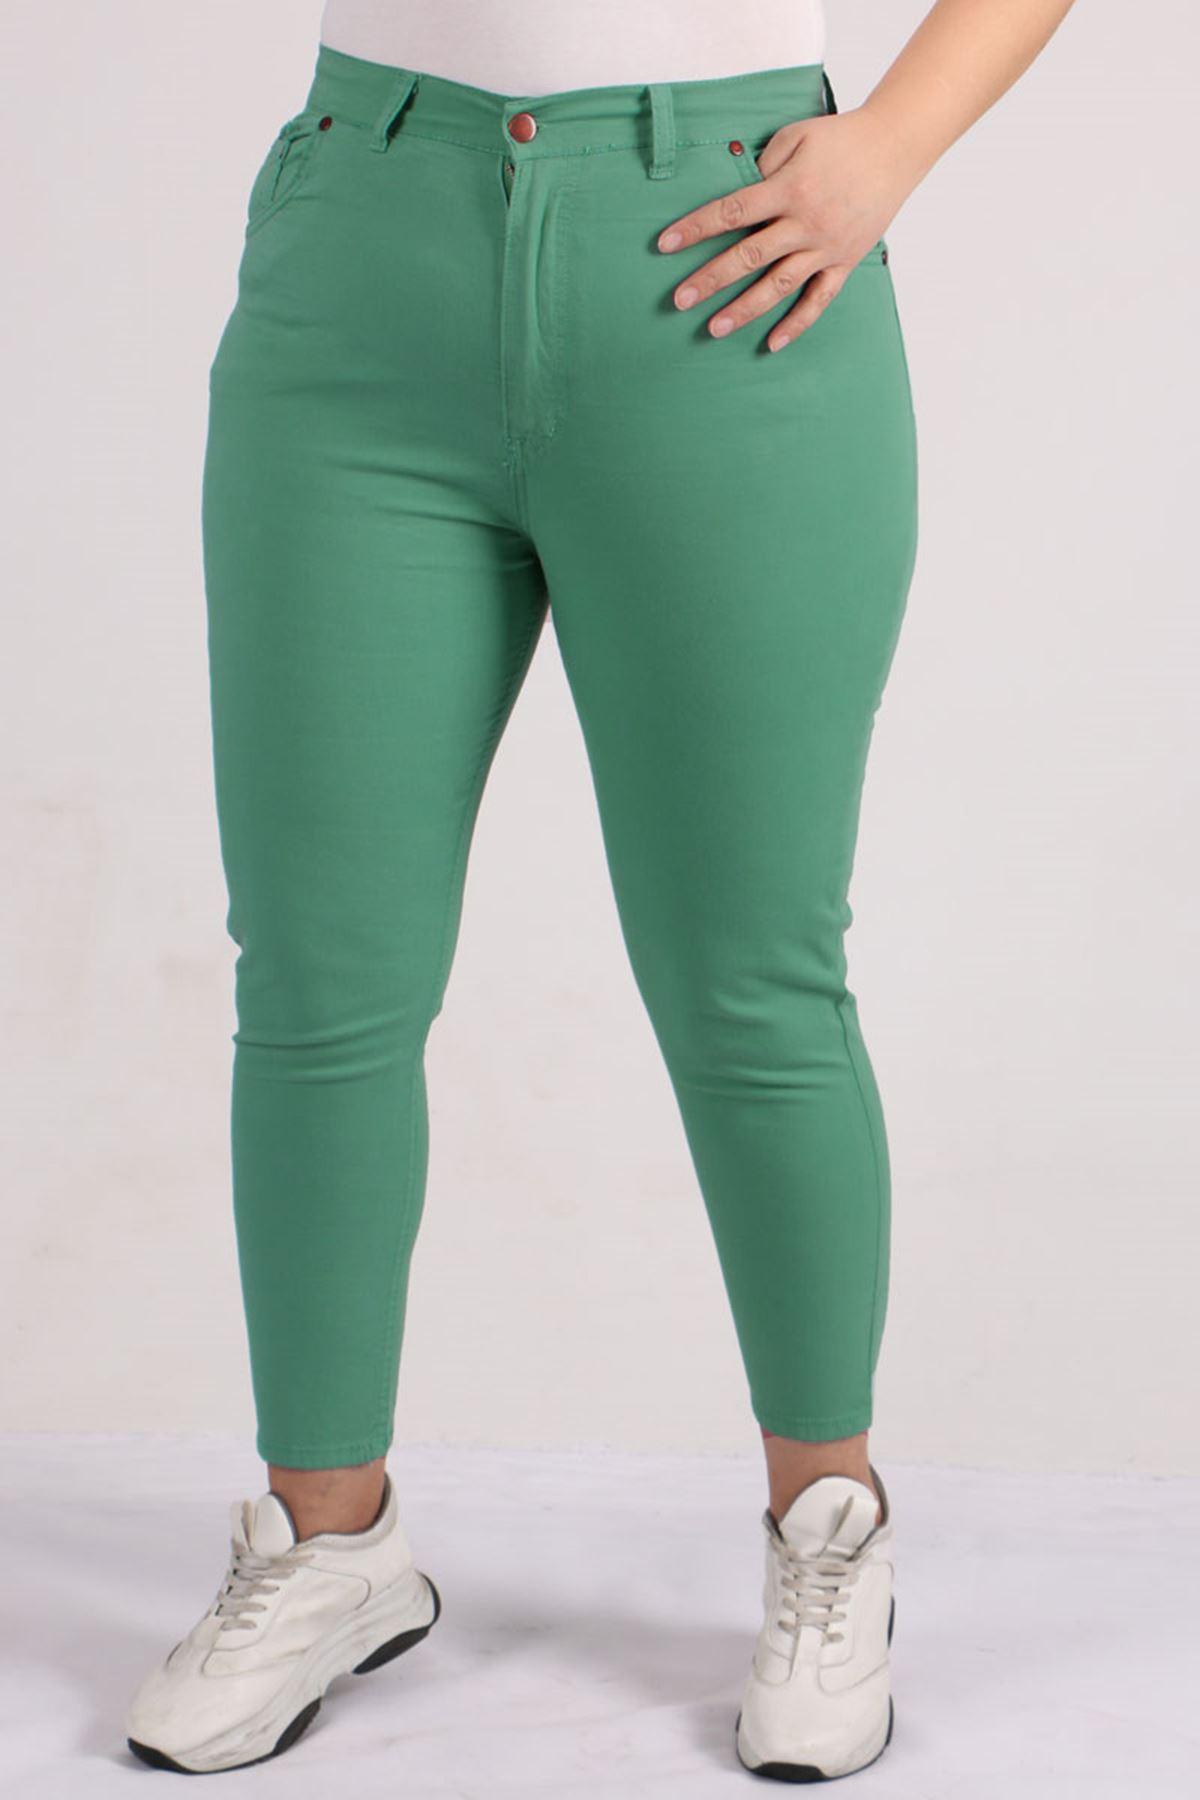 9115 Oversize Skinny Leg Pants - Naphtha Green